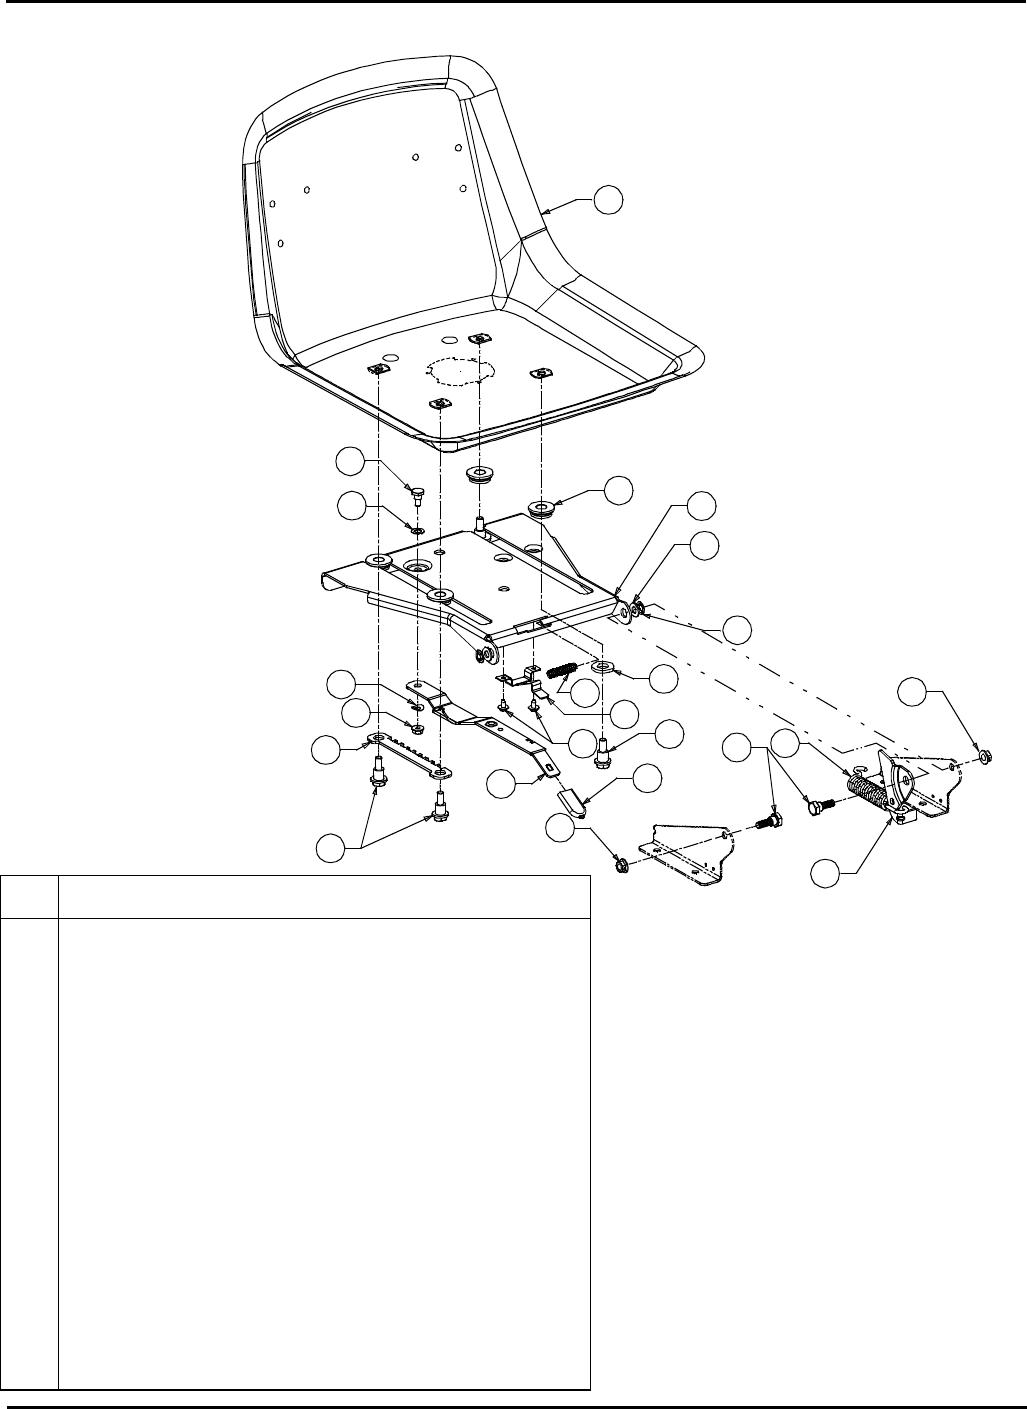 Cub Cadet Hydrostatic Lawn Tractor 1515 Parts Manual 770